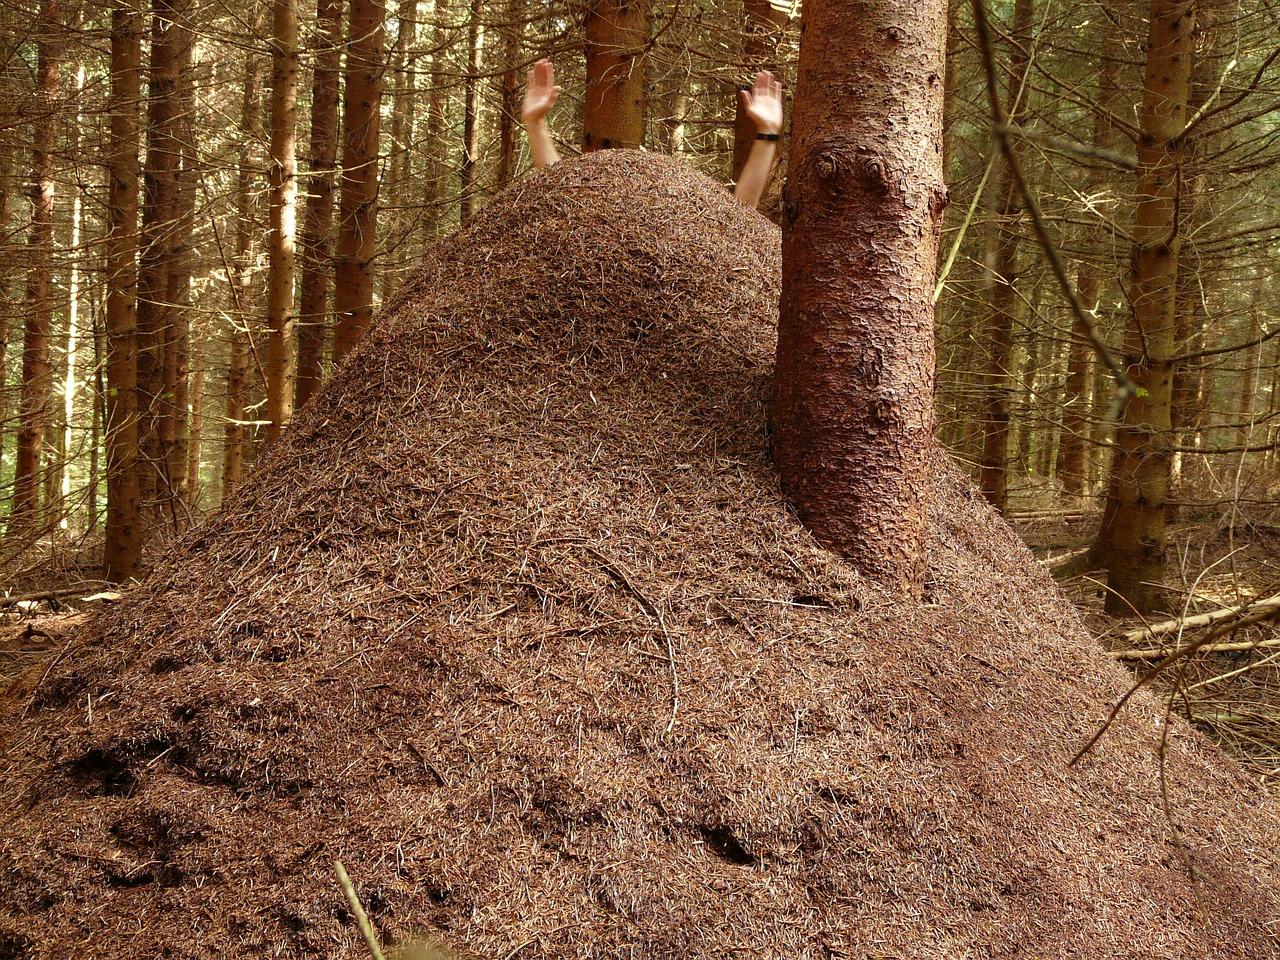 Mrowisko mrówki rudnicy, fot. Hans Braxmeier DP